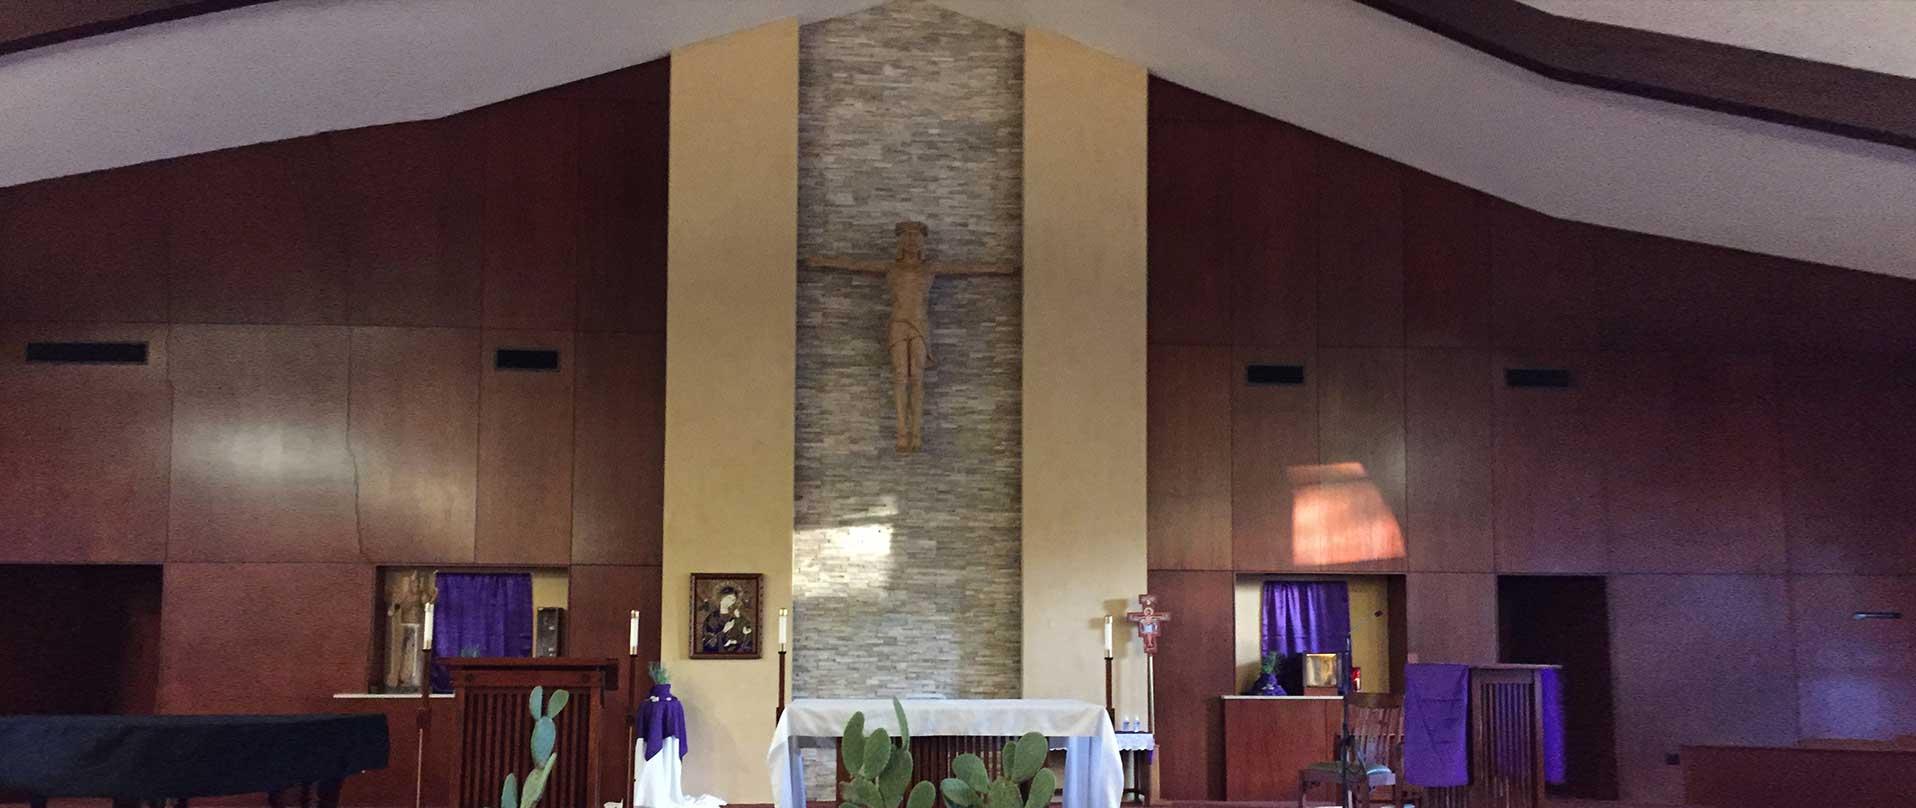 <br><center>St. Matthias Parish<br><strong>&</strong> Preschool</center><center><strong>Redwood City, California</strong></center>